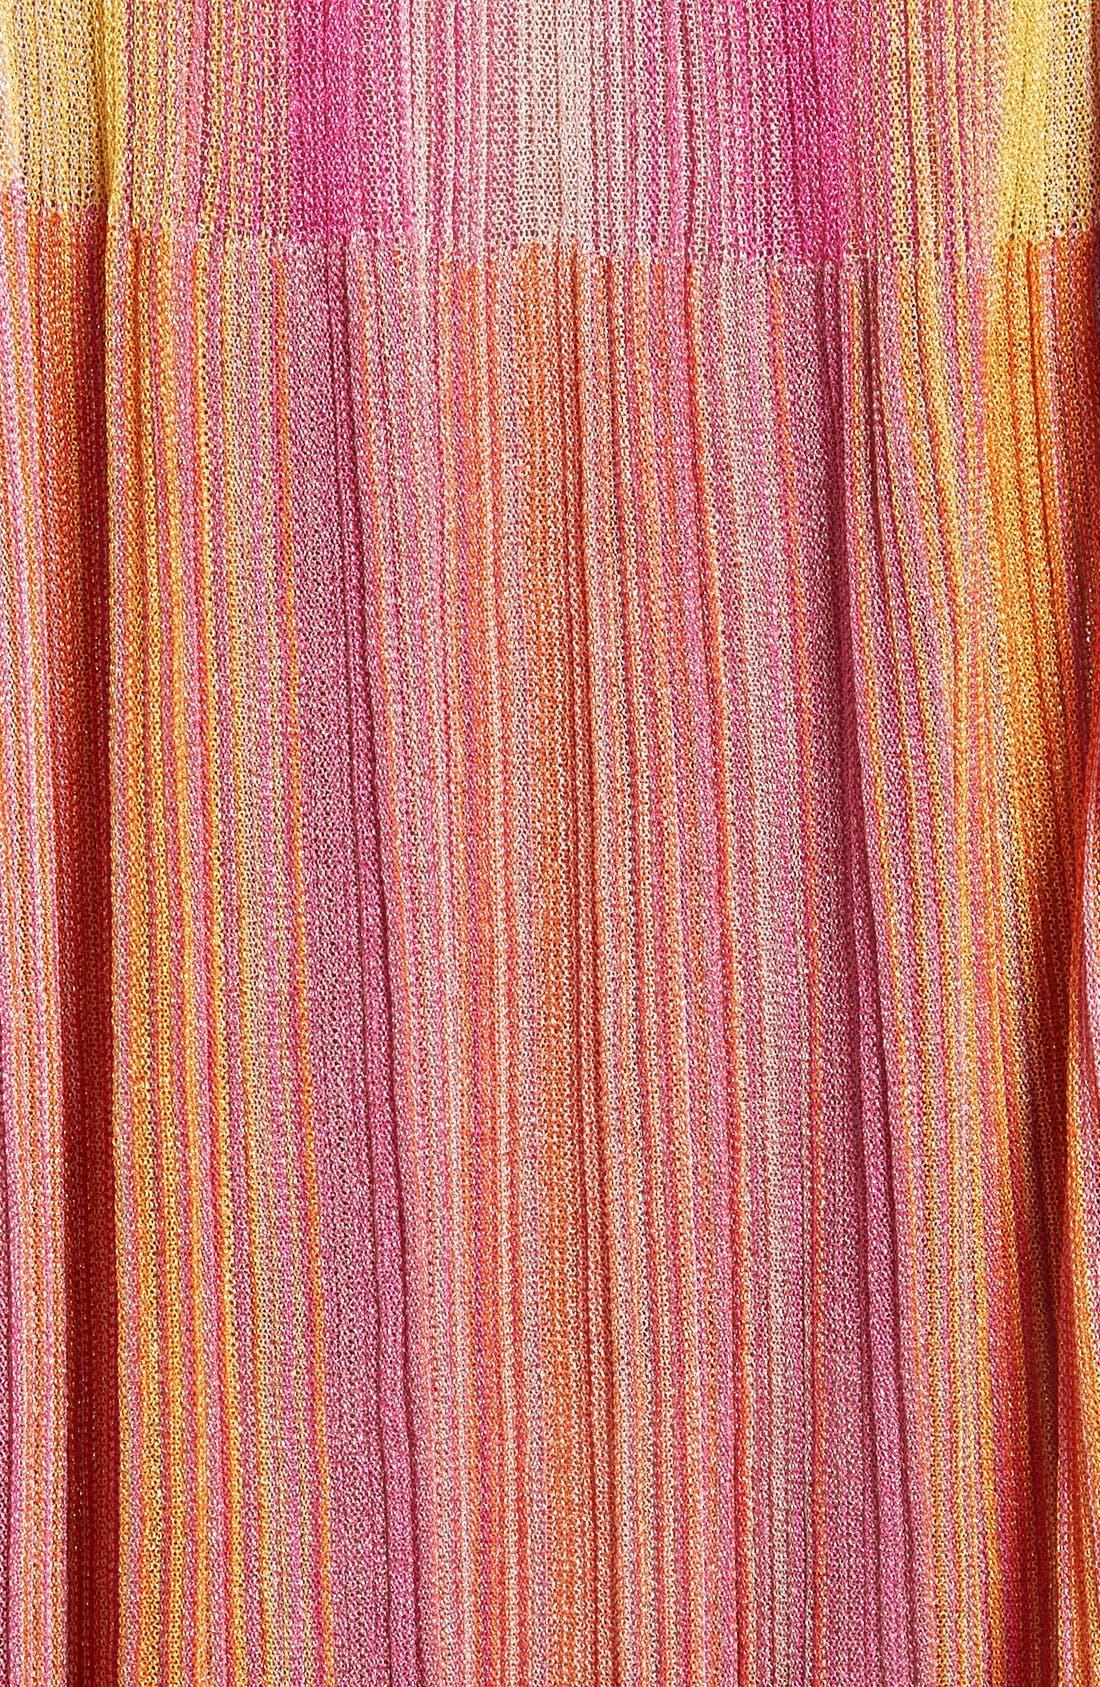 Alternate Image 5  - M Missoni Plissé Metallic Knit Shift Dress